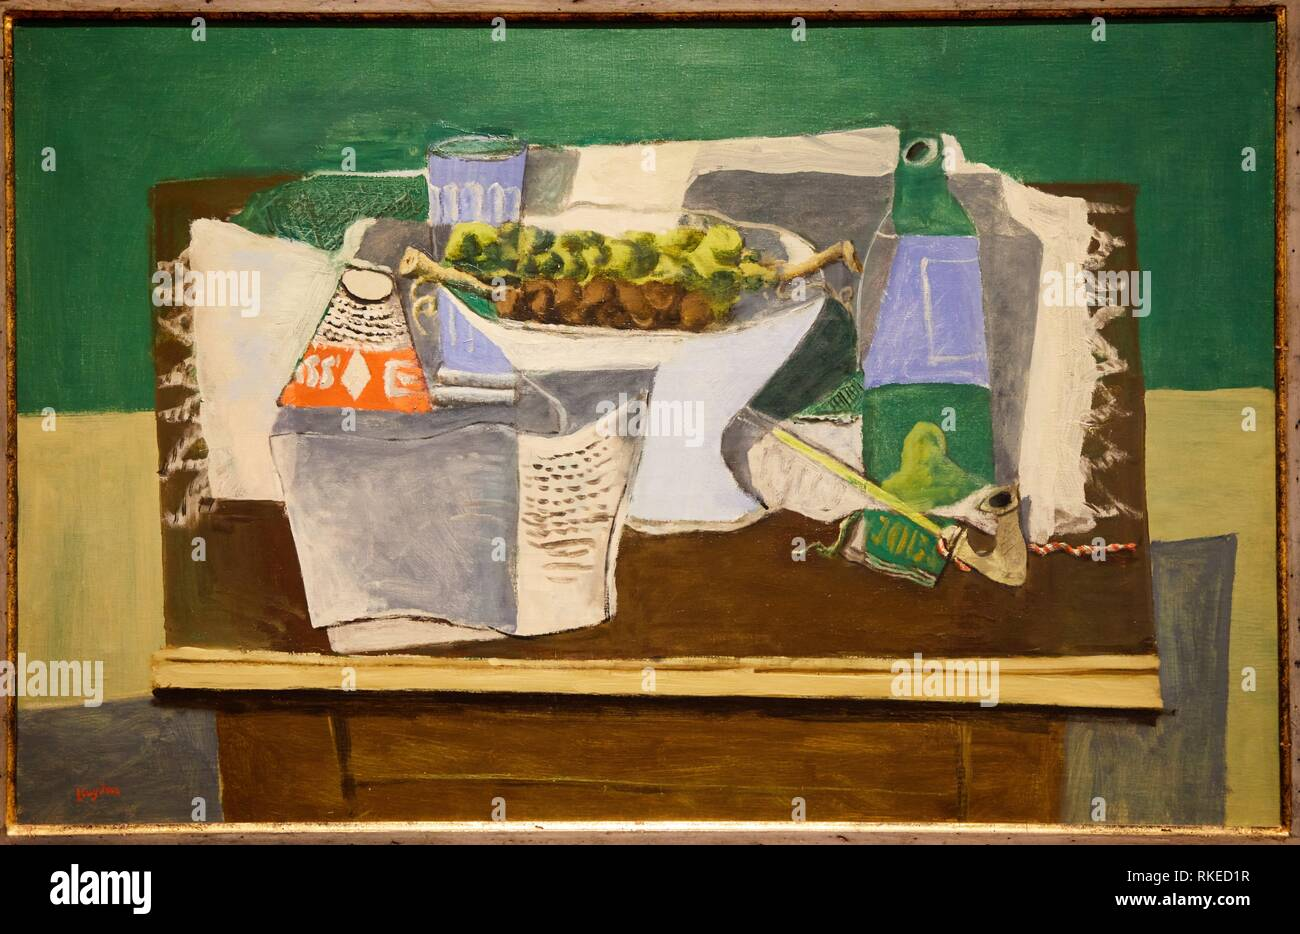 Henri Hayden, Nature morte sur fond vert, 1920, Museo de Bellas Artes, Fine Arts Museum, Bilbao, Bizkaia, Euskadi, Spain, Europe - Stock Image